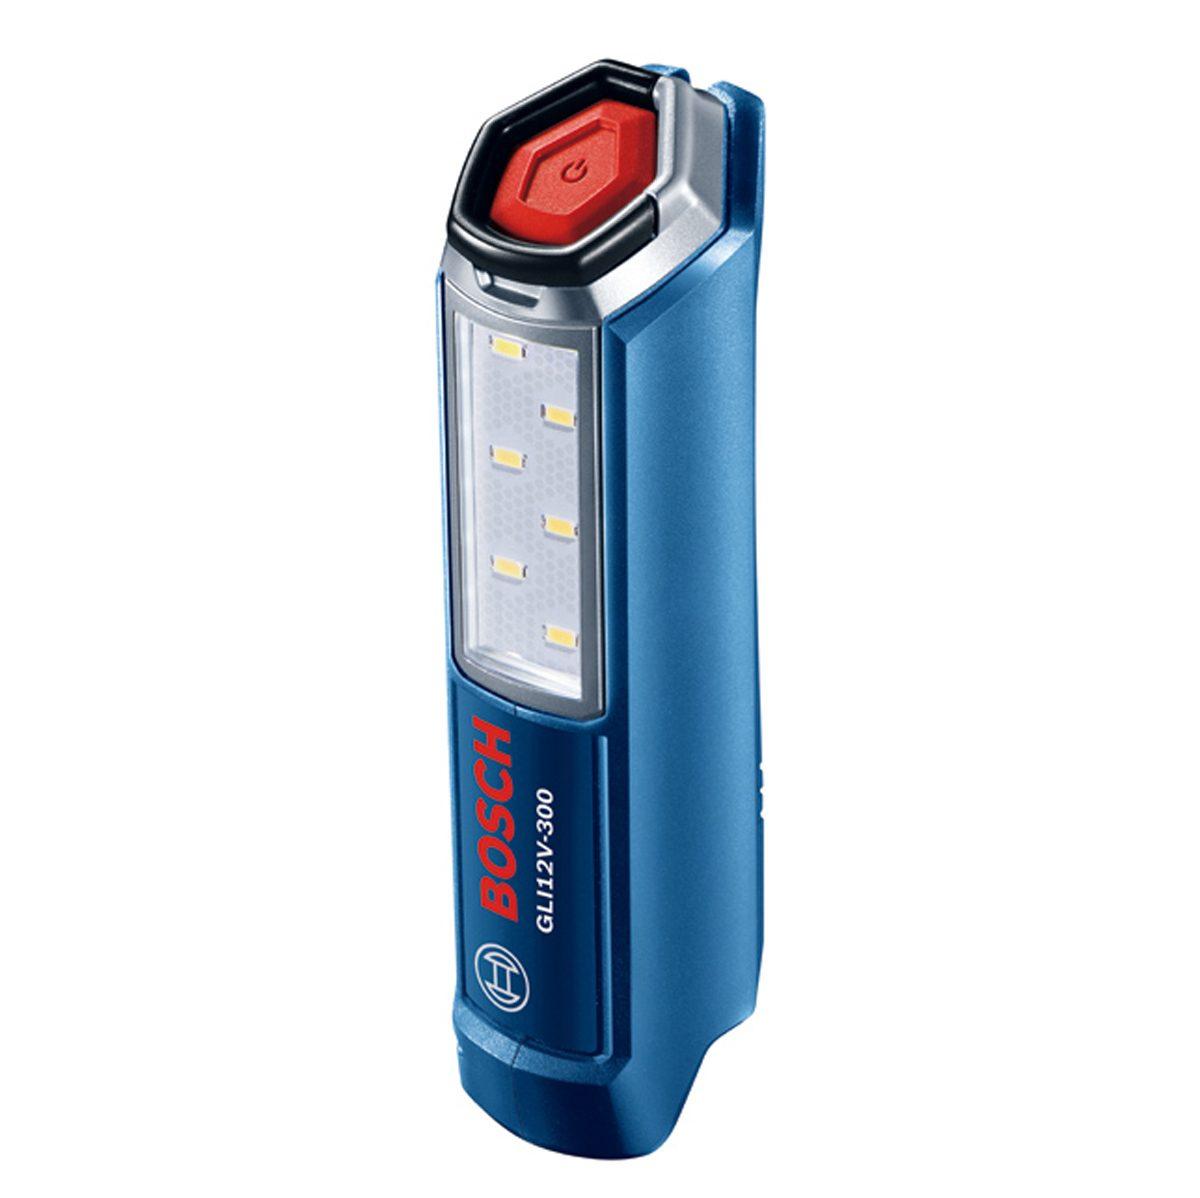 Bosch LED Worklights